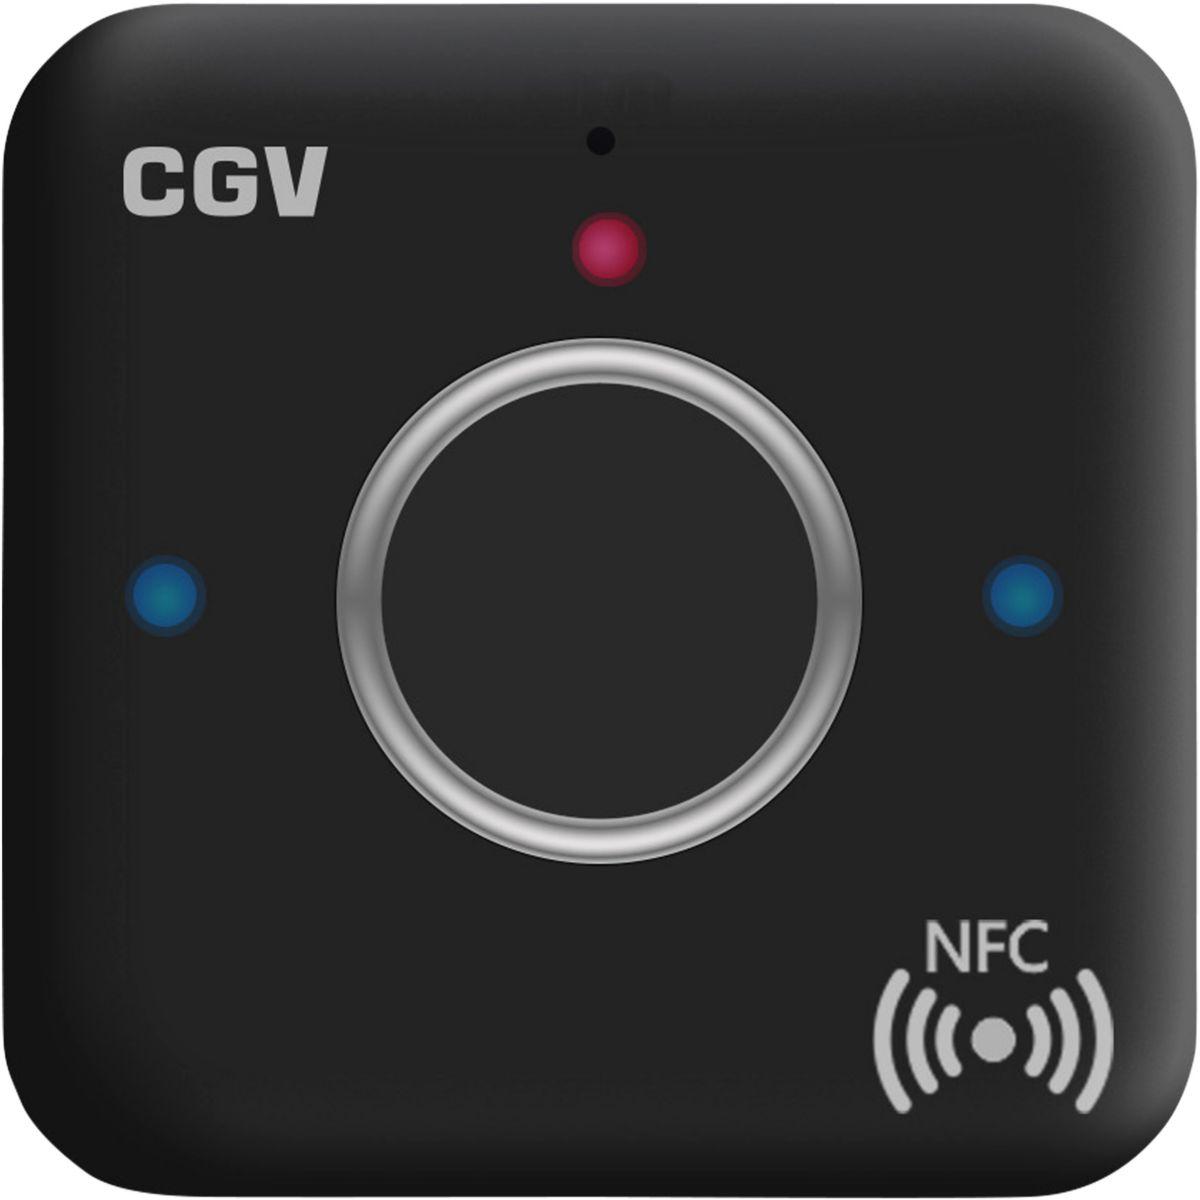 Adaptateur CGV MyBTplayer 1.0 (photo)